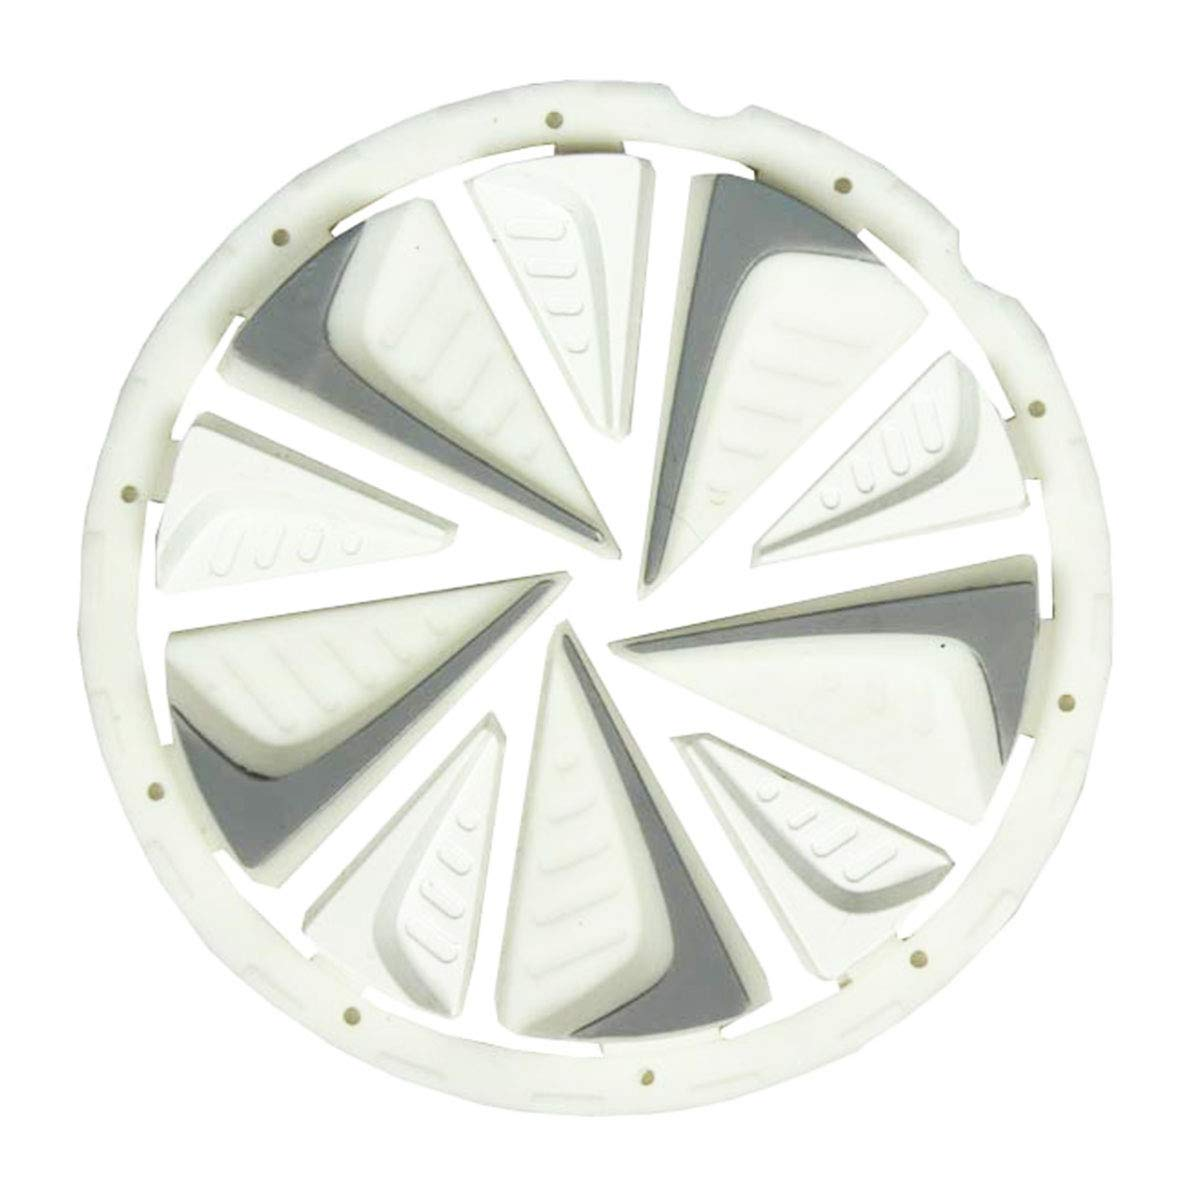 Exalt Paintball Fast Feed - Dye Rotor/LTR - White by Exalt